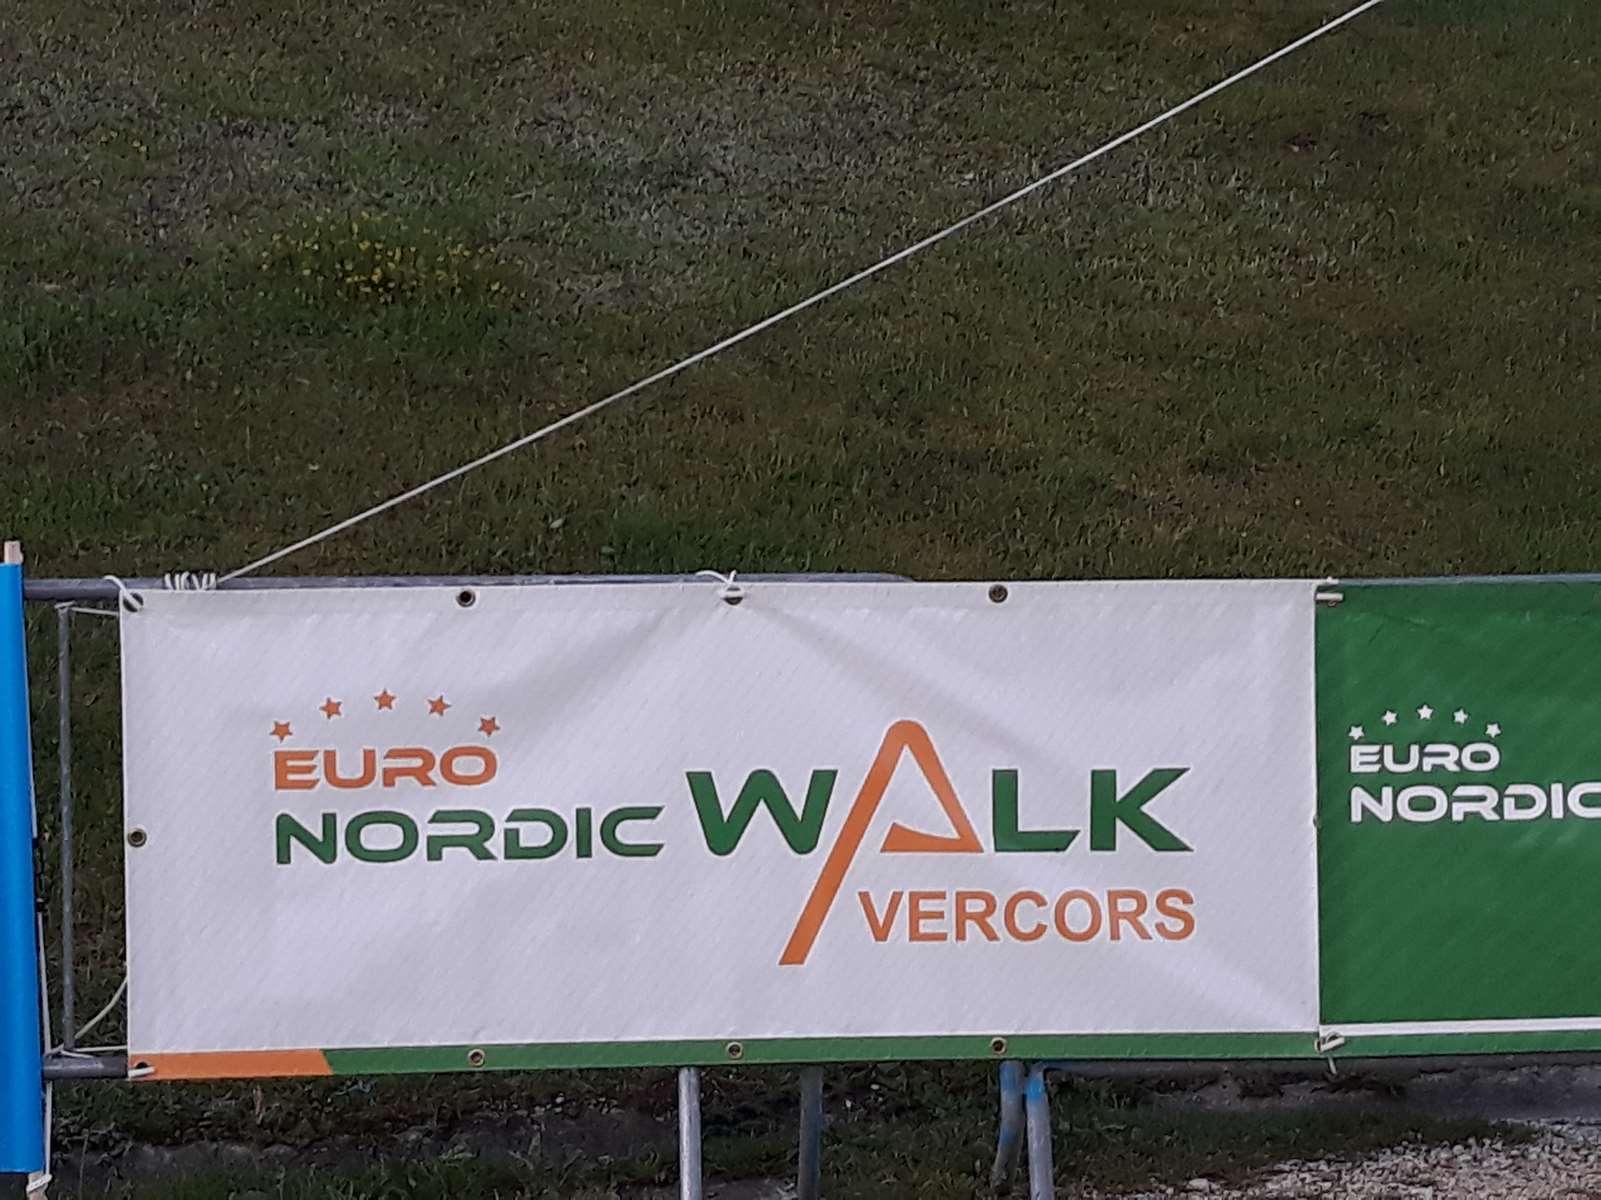 EURO NORDIC WaLK VERCORS  vendredi 08 Juin 2018